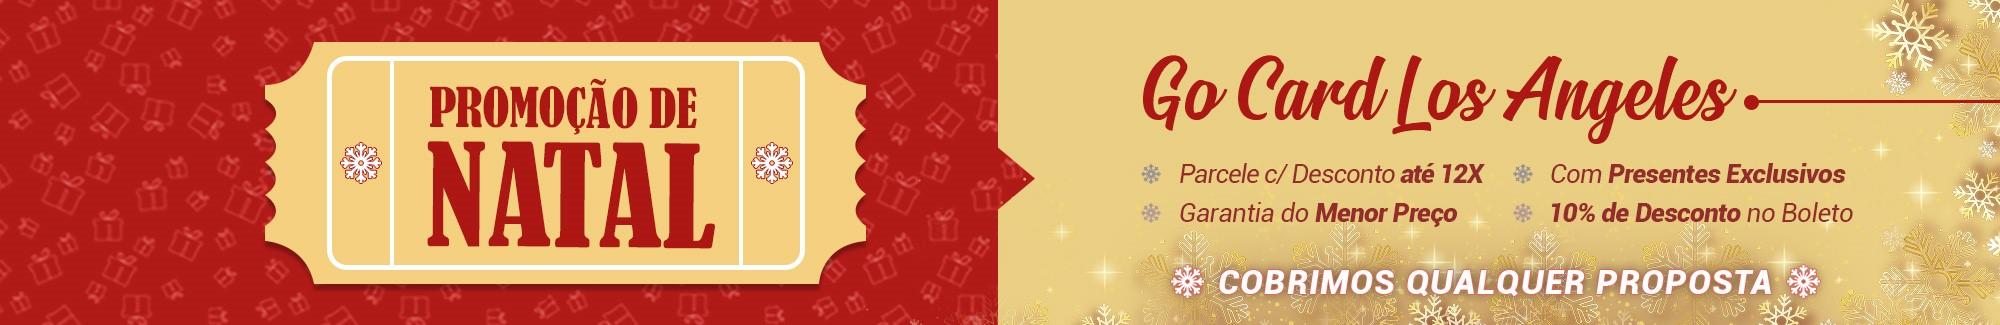 Natal Go Card Los Angeles